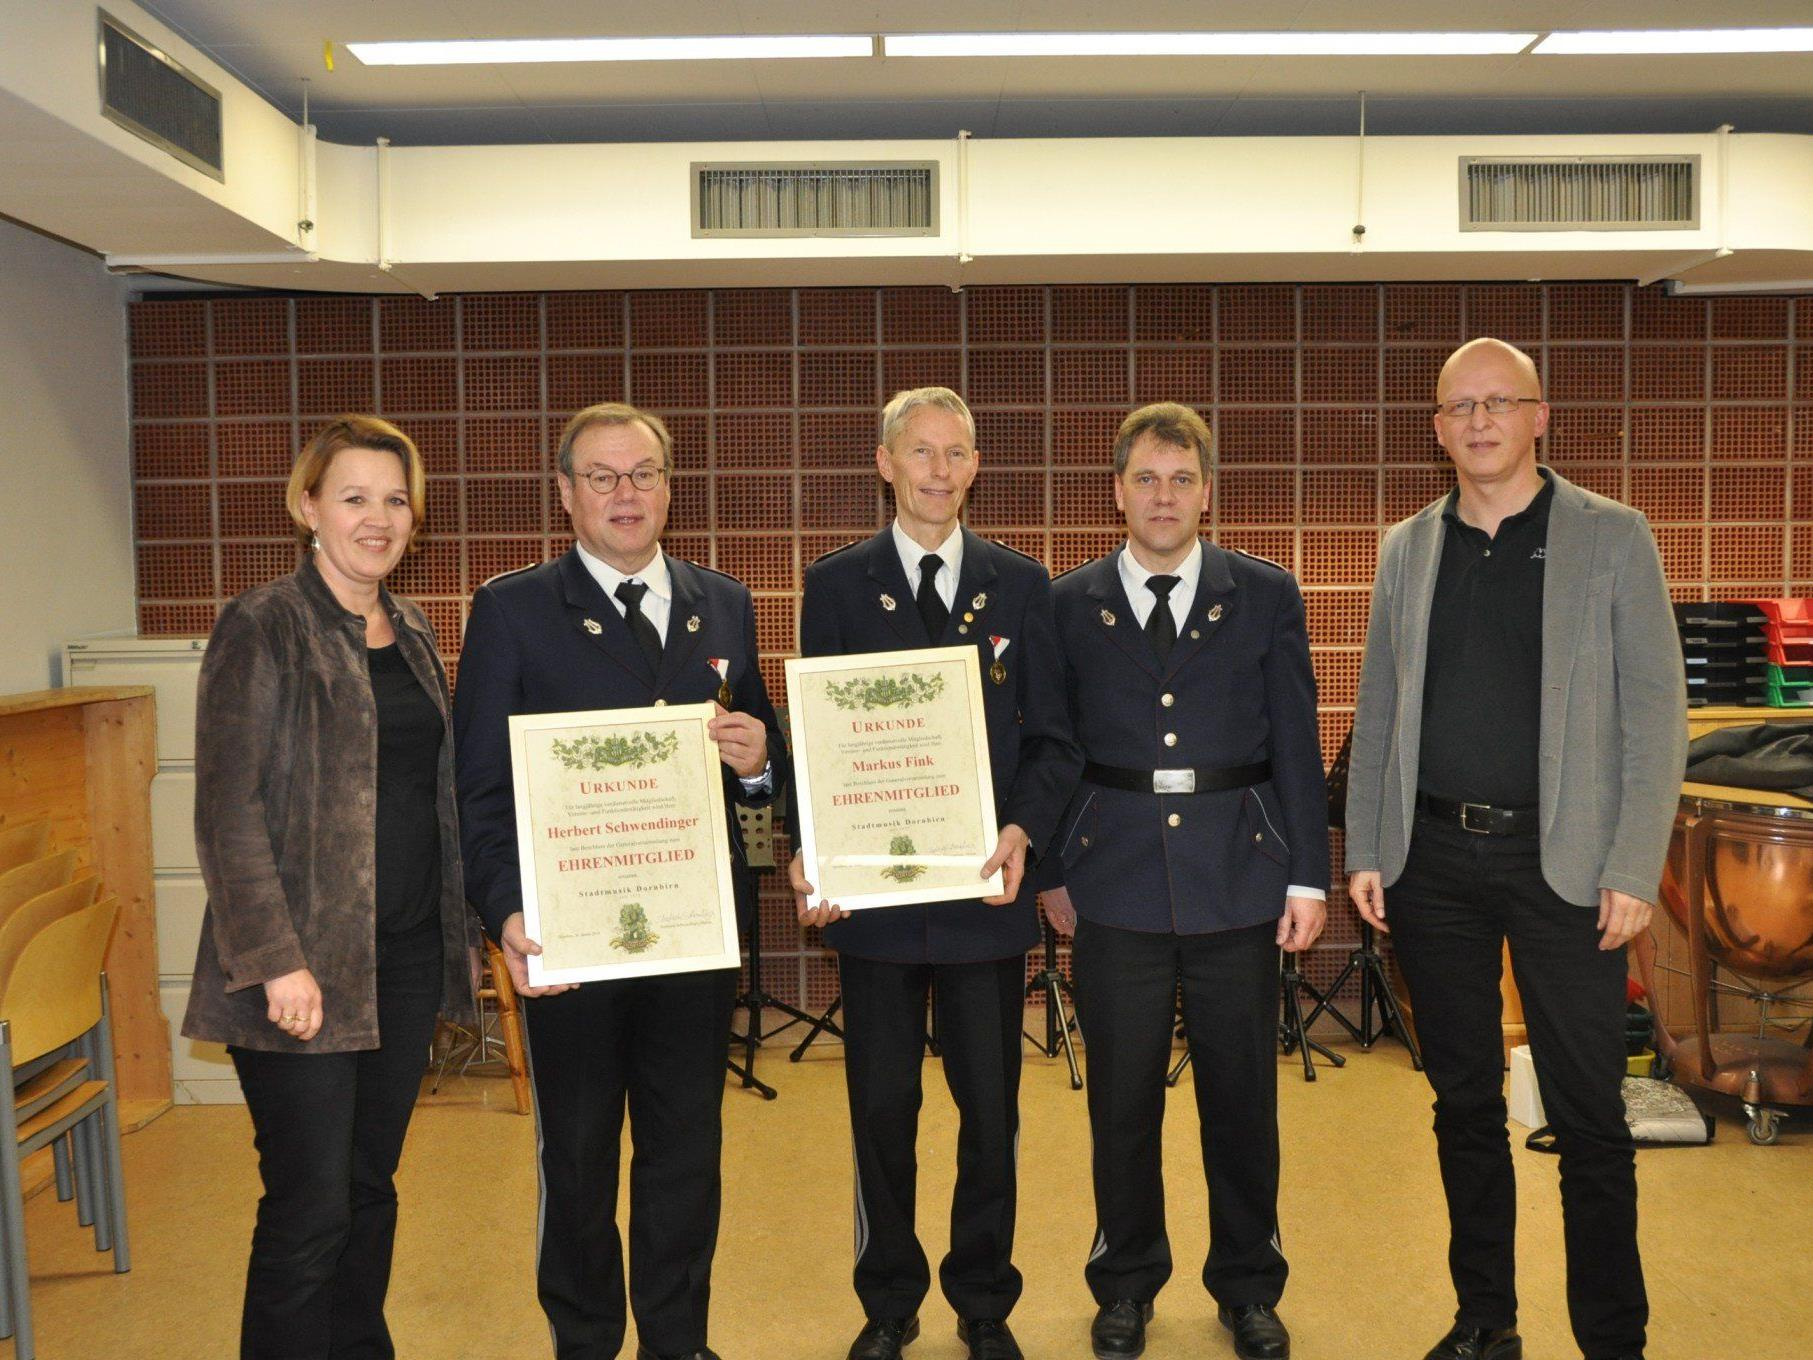 BM Andrea Kaufmann, Herbert Schwendinger, Markus Fink, Obm.Franco Todeschi, Dir. Ivo Warenitsch